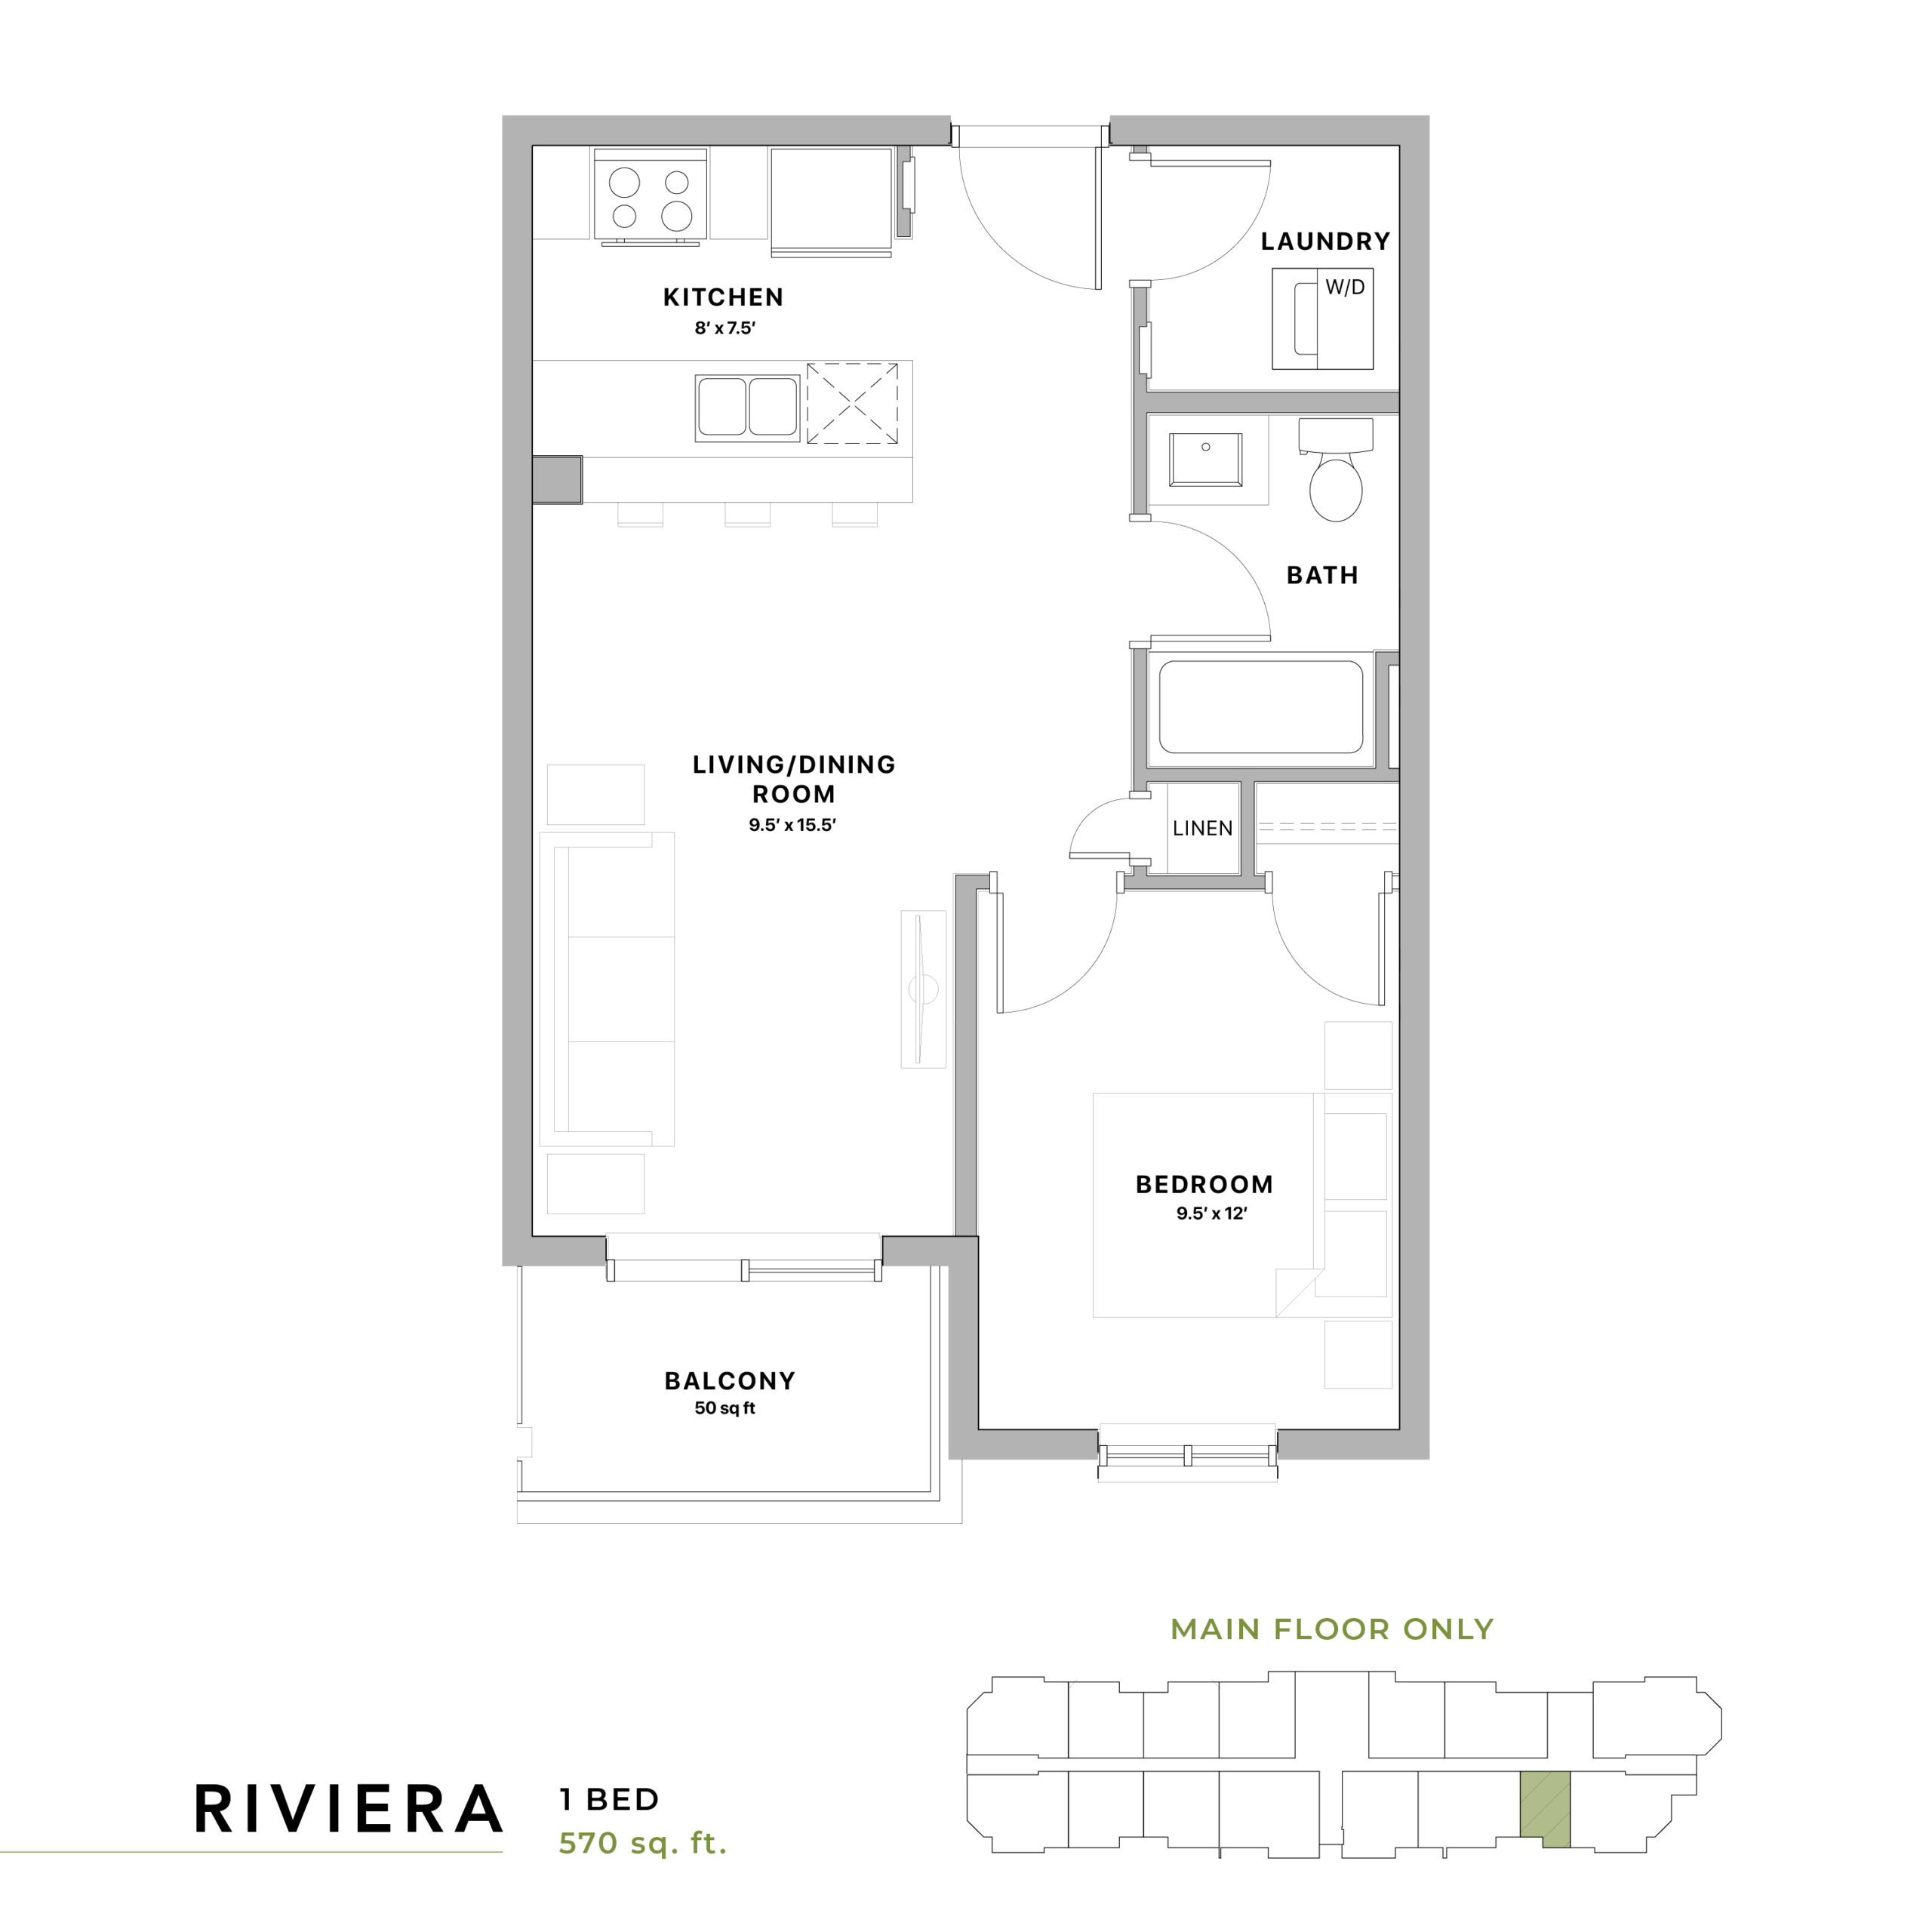 Riviera Floorplan